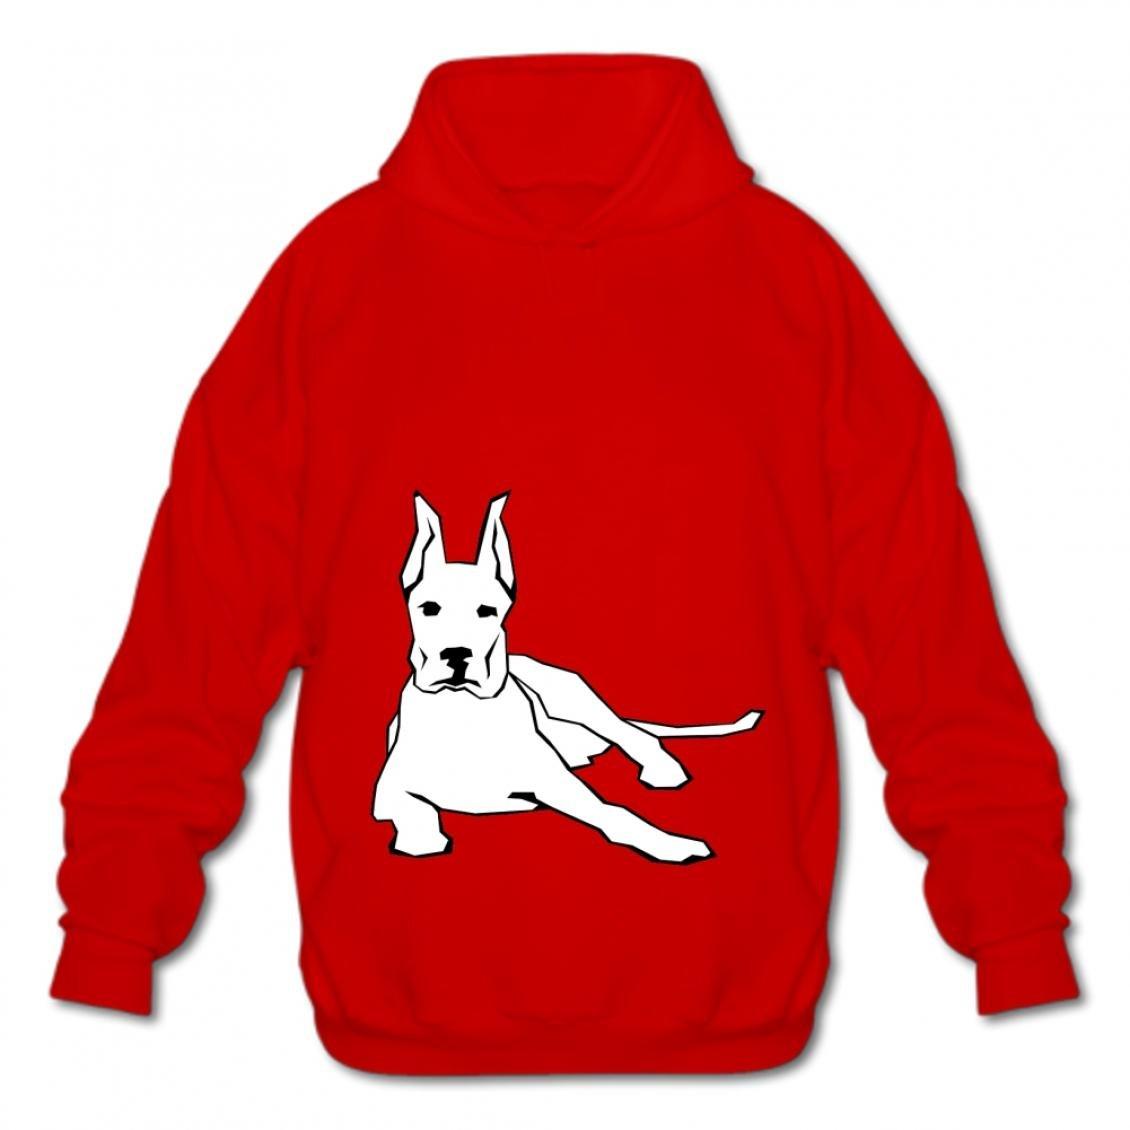 Euochengqus Mens Style Cotton Pullover Fashion Hoodies-03 Cartoon Dog Tqke Hooded Sweatshirt